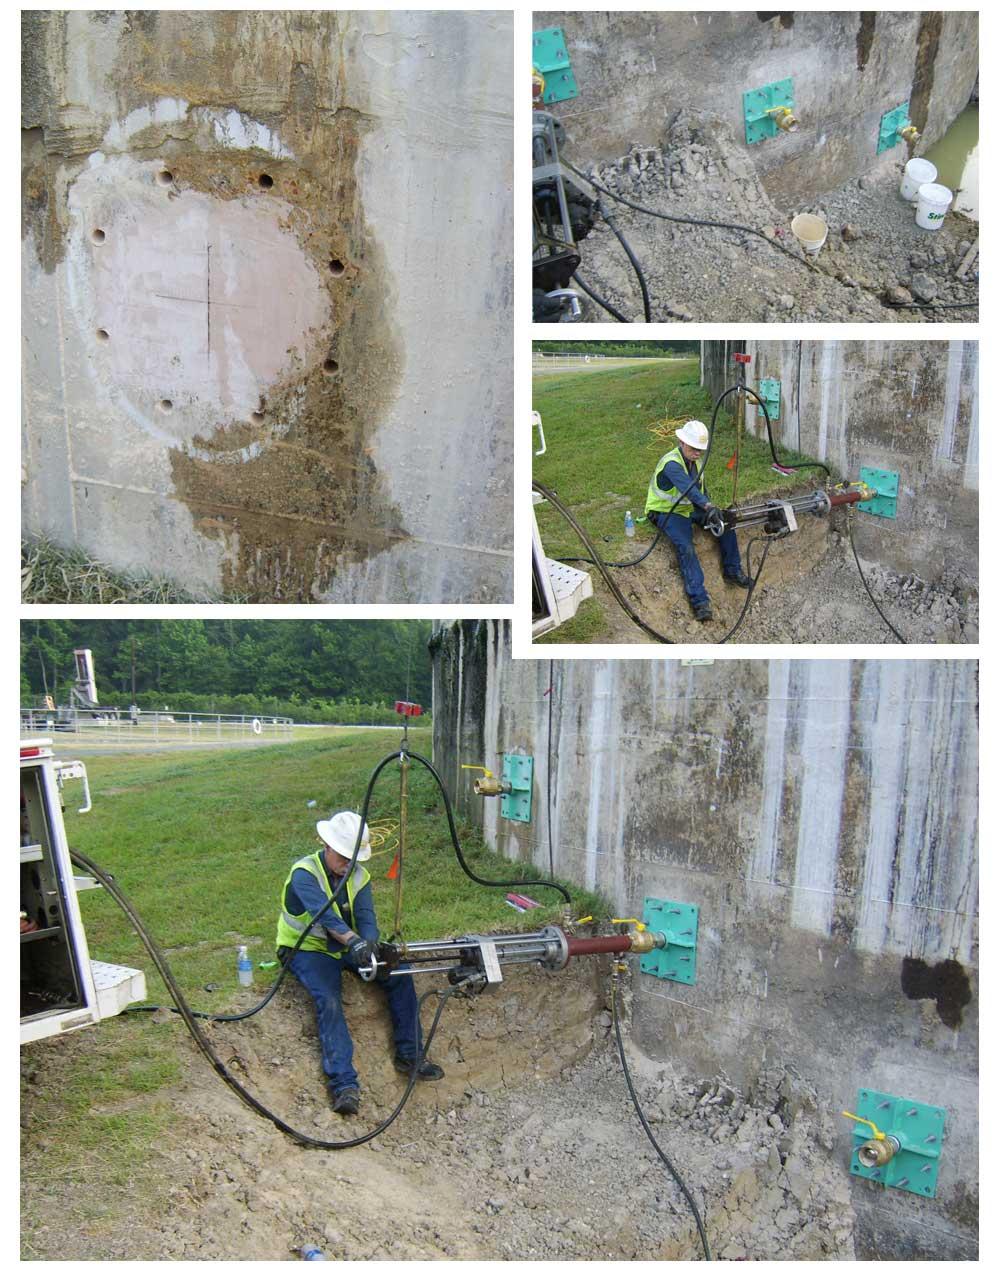 wall taps tank taps vessel taps with slug retention